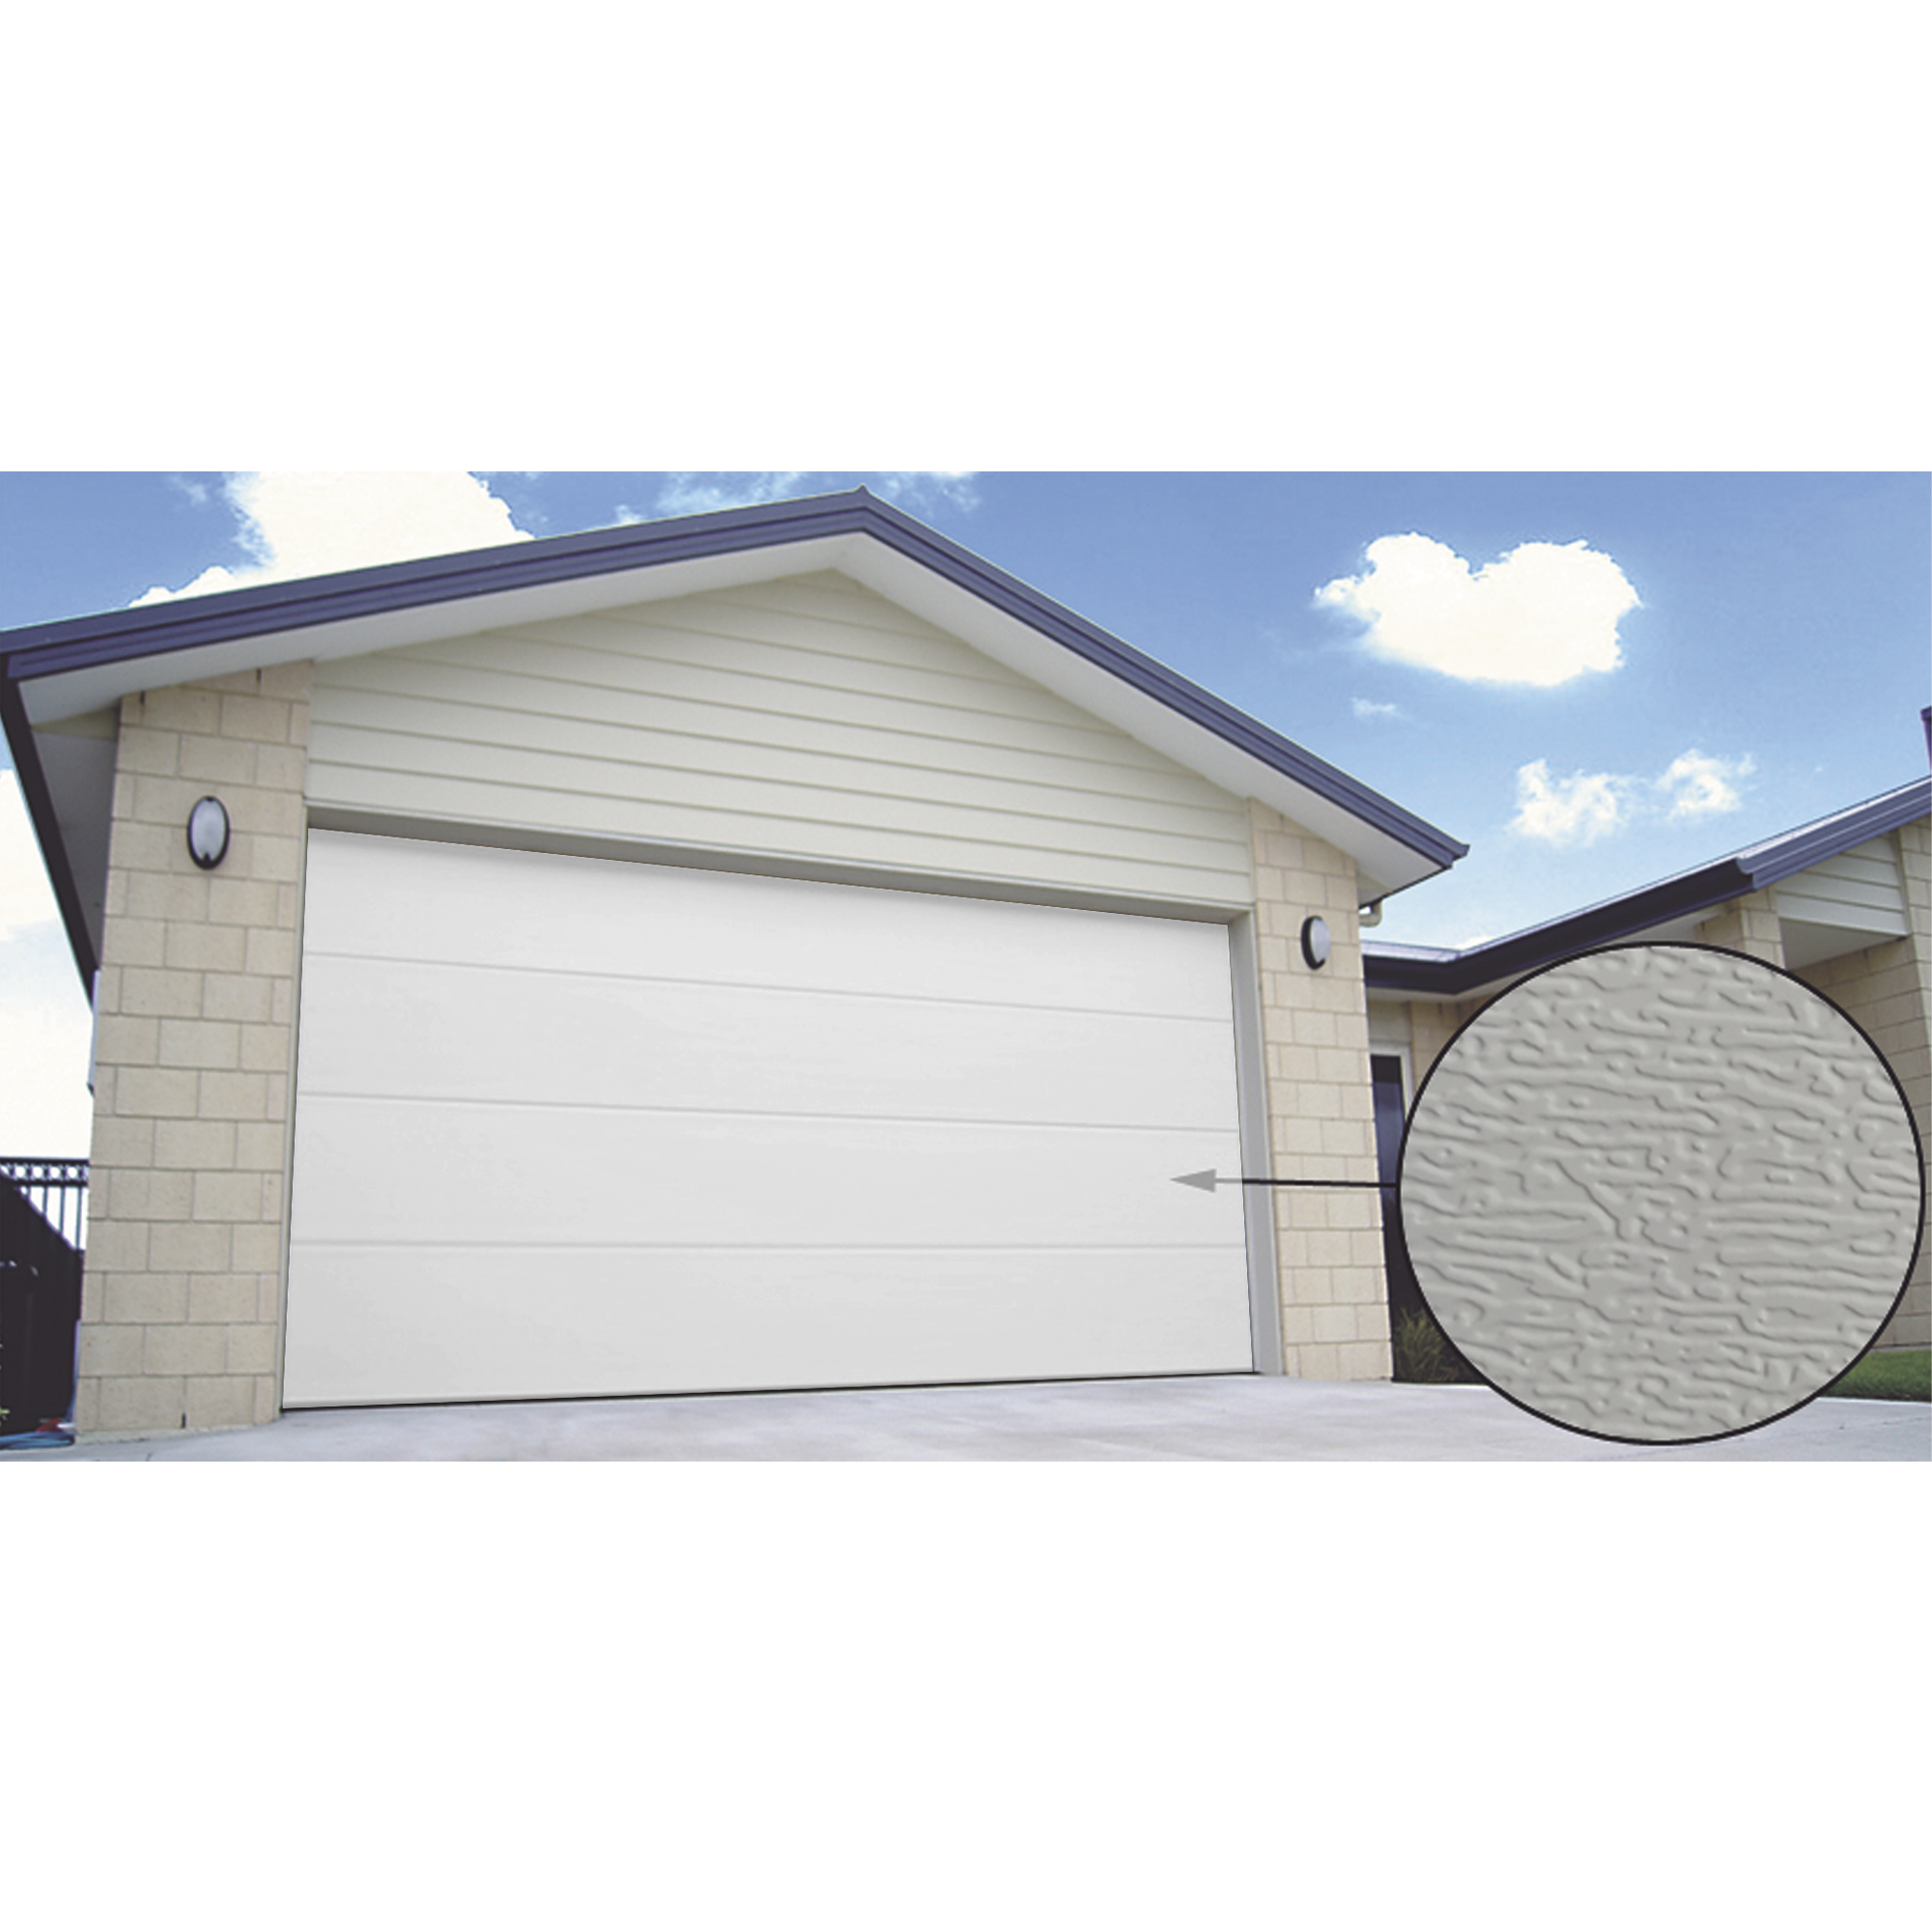 Puerta de Garage PREMIUM, Lisa color blanco  18X8 FT, AISLADA, Estilo U.S.A.